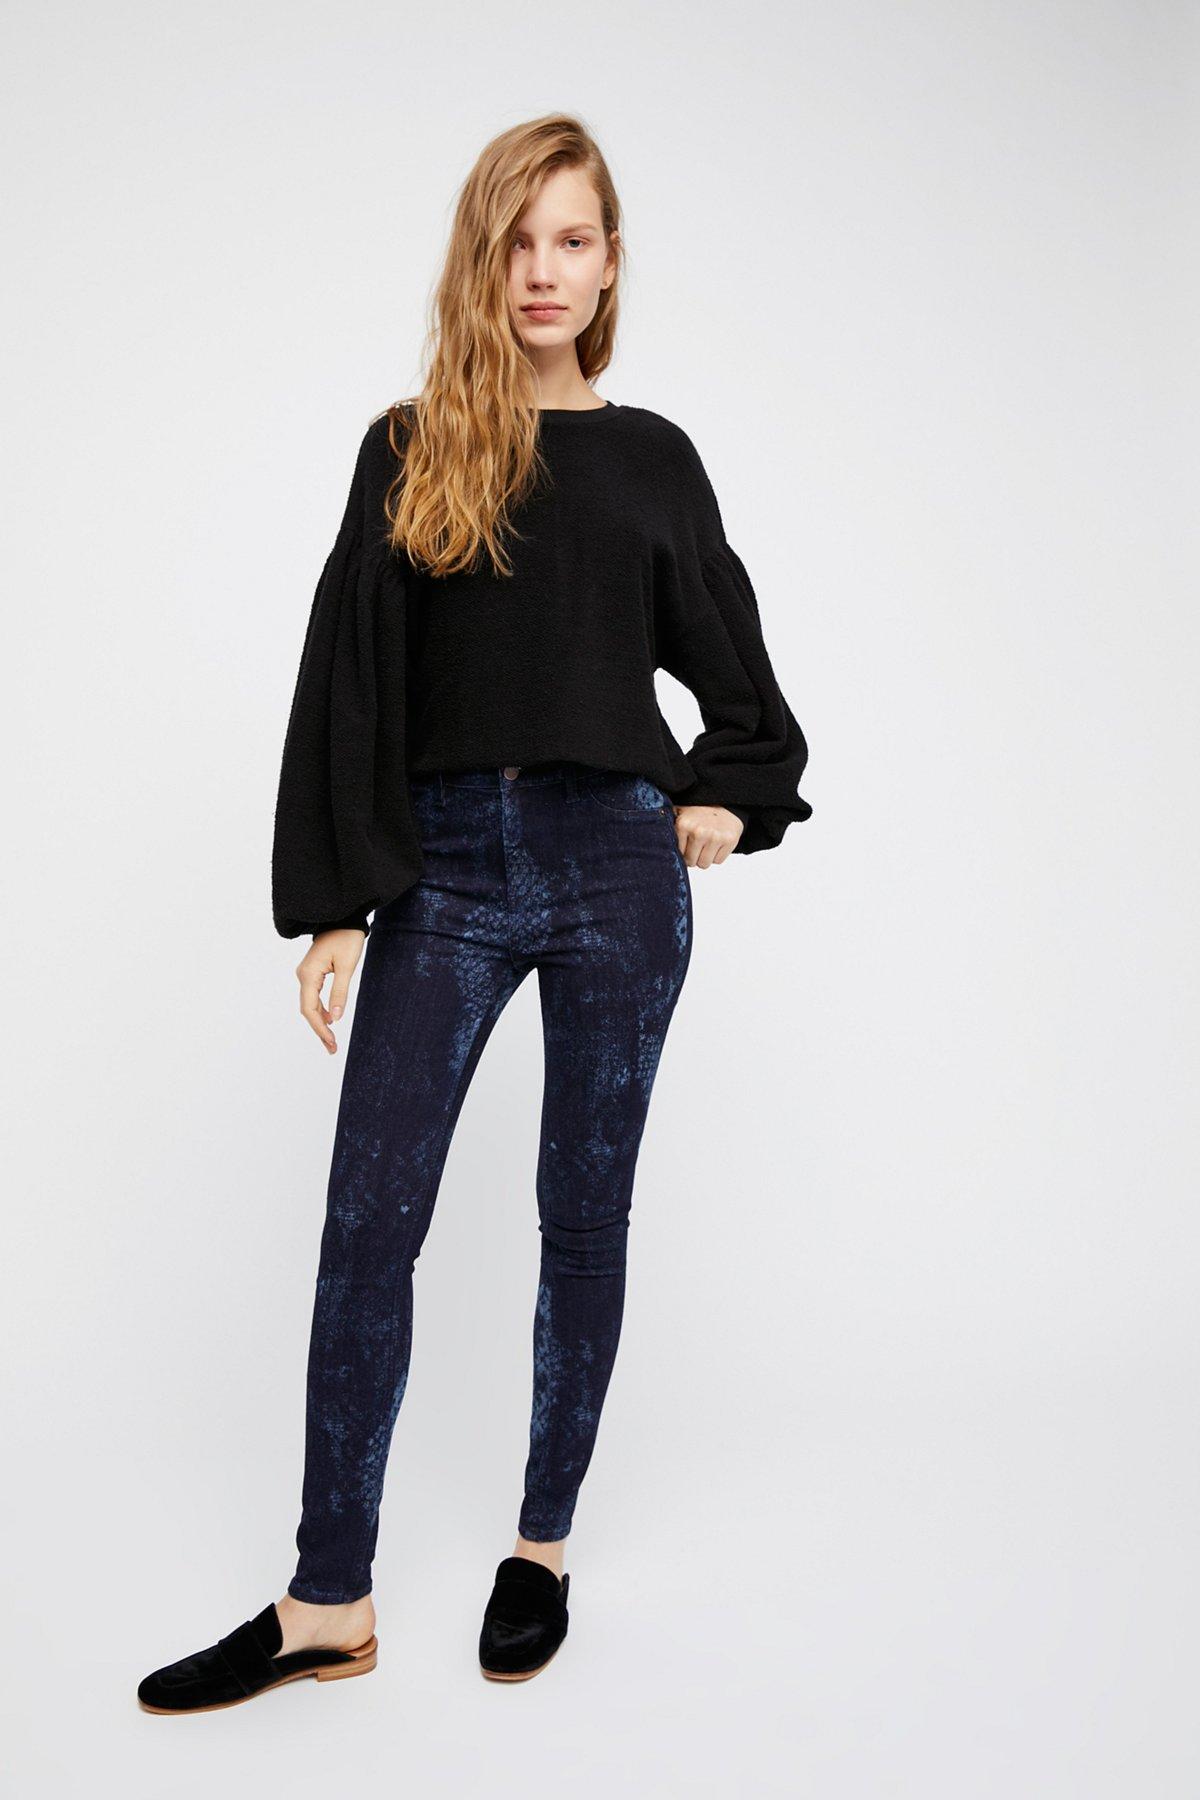 Long & Lean蕾丝蛇纹牛仔裤